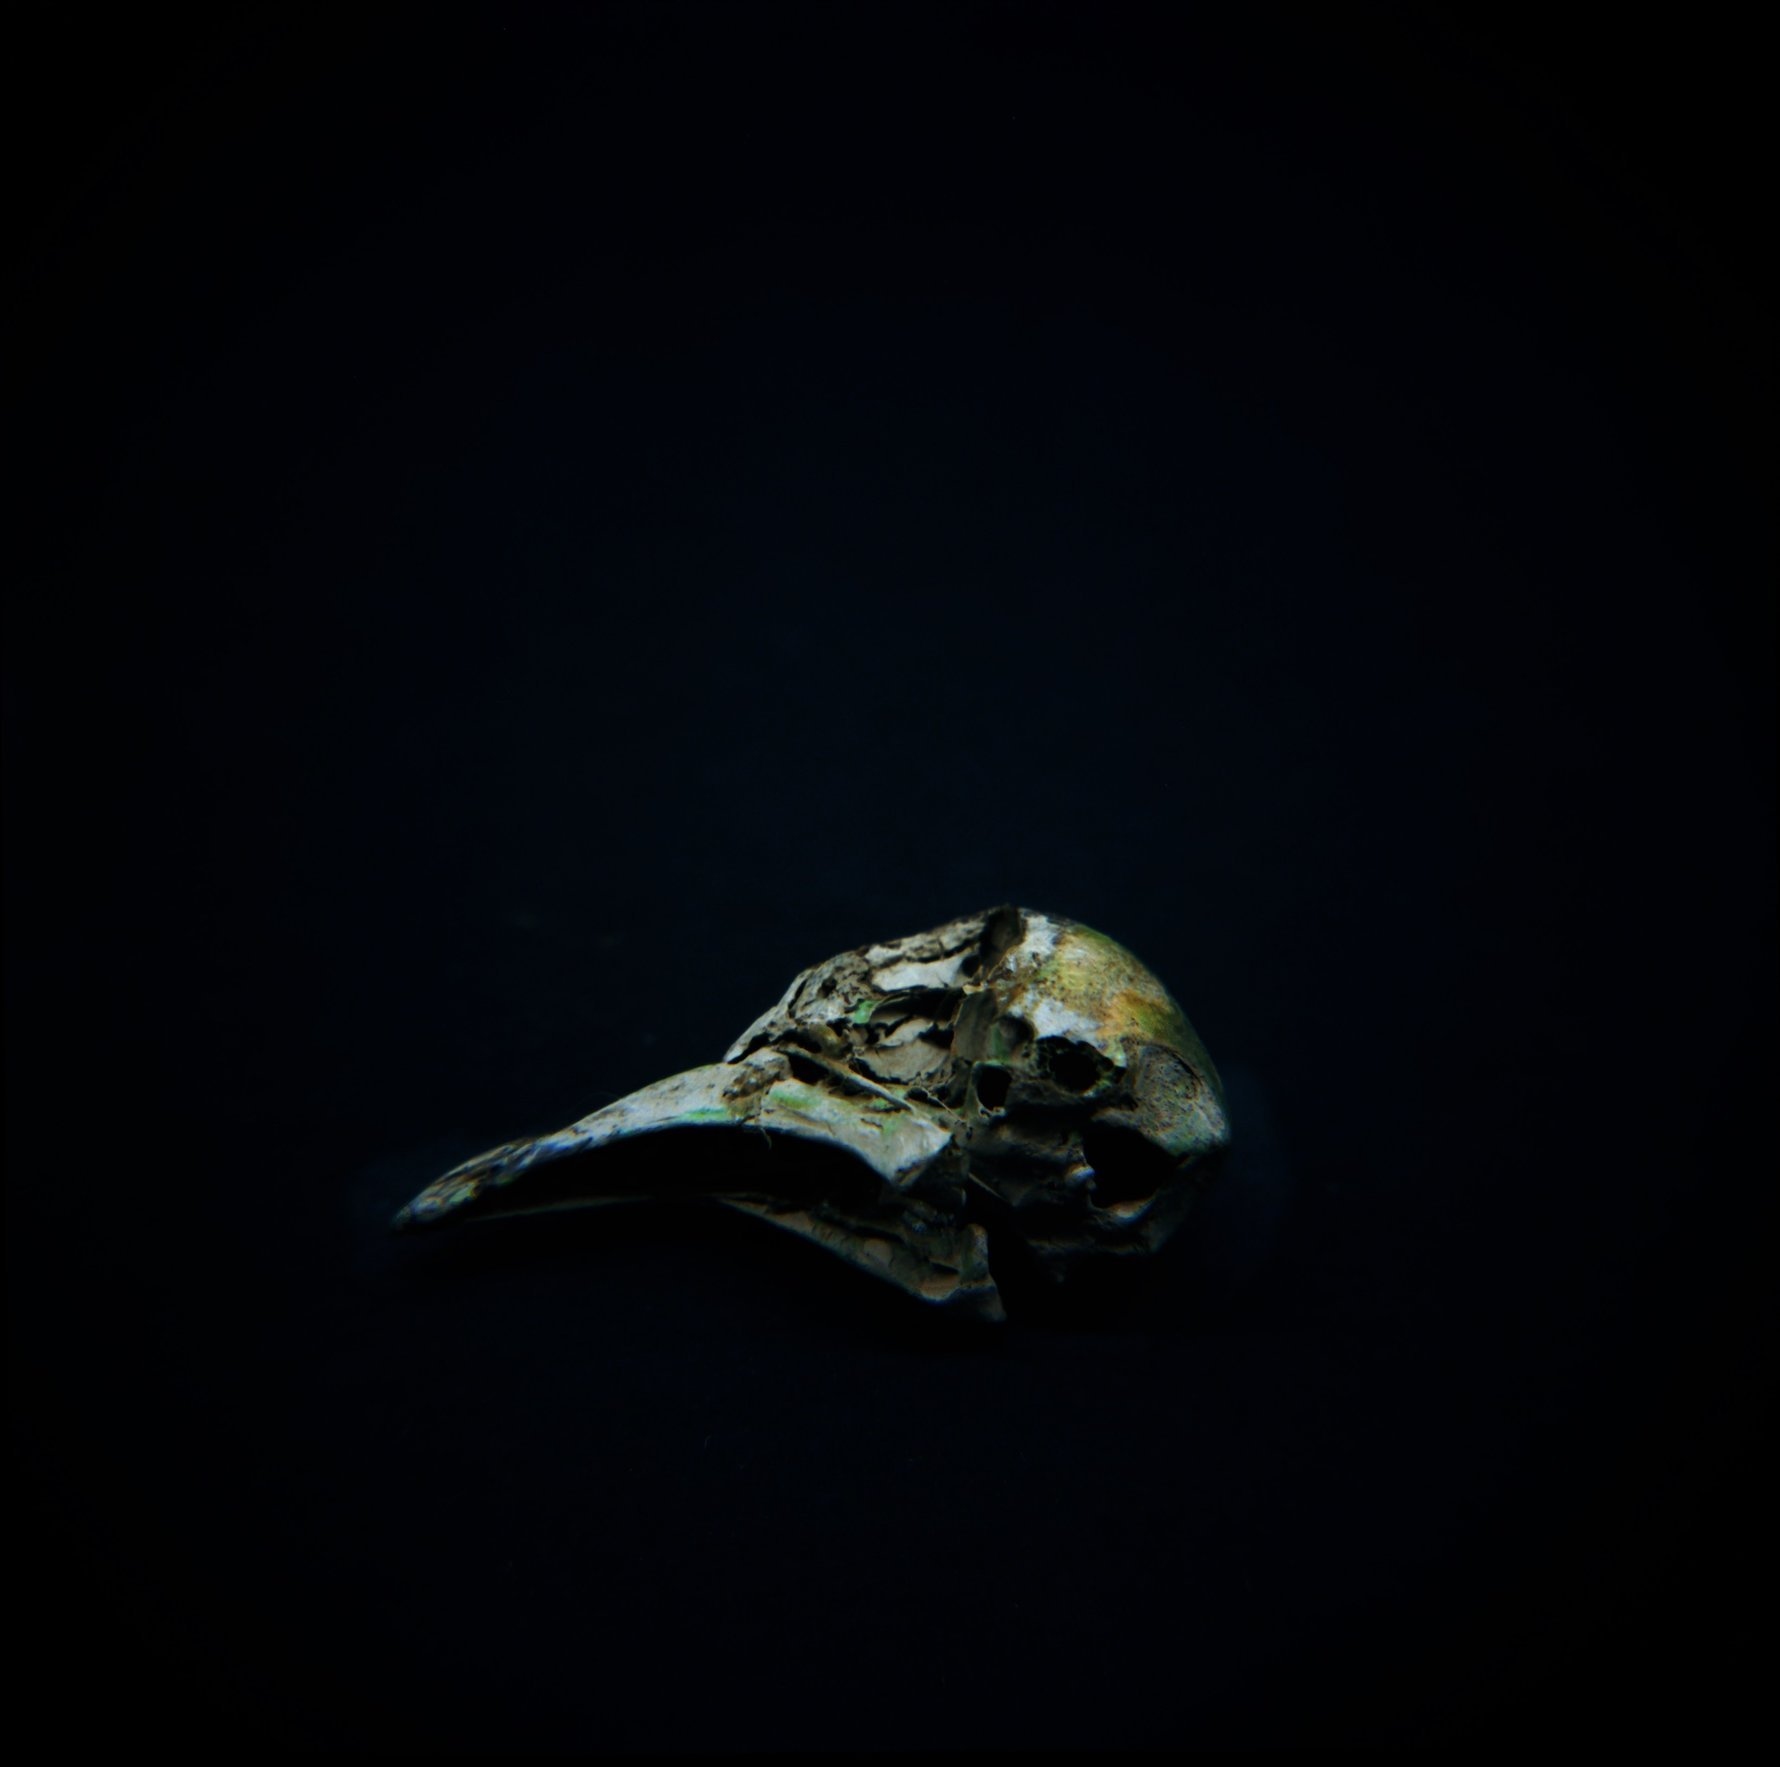 Skull, Passenger Pigeon (<i>Ectopistes migratorius</i>), Holga 120N, Kodak Ektar 100, 2015